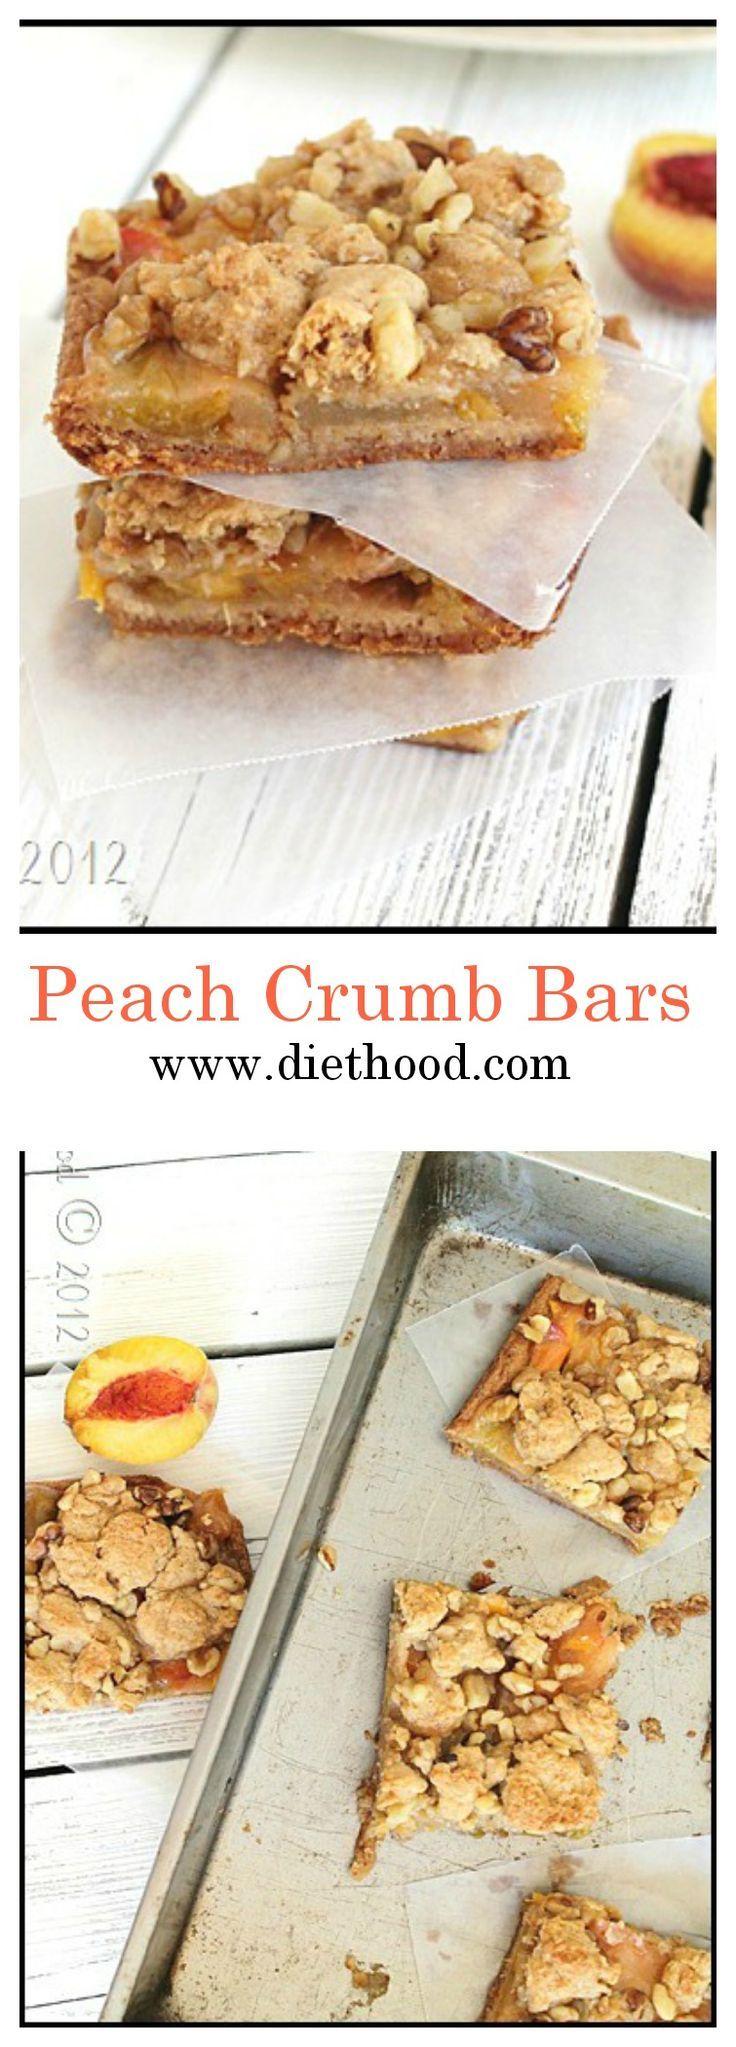 Peach Crumb Bars | www.diethood.com